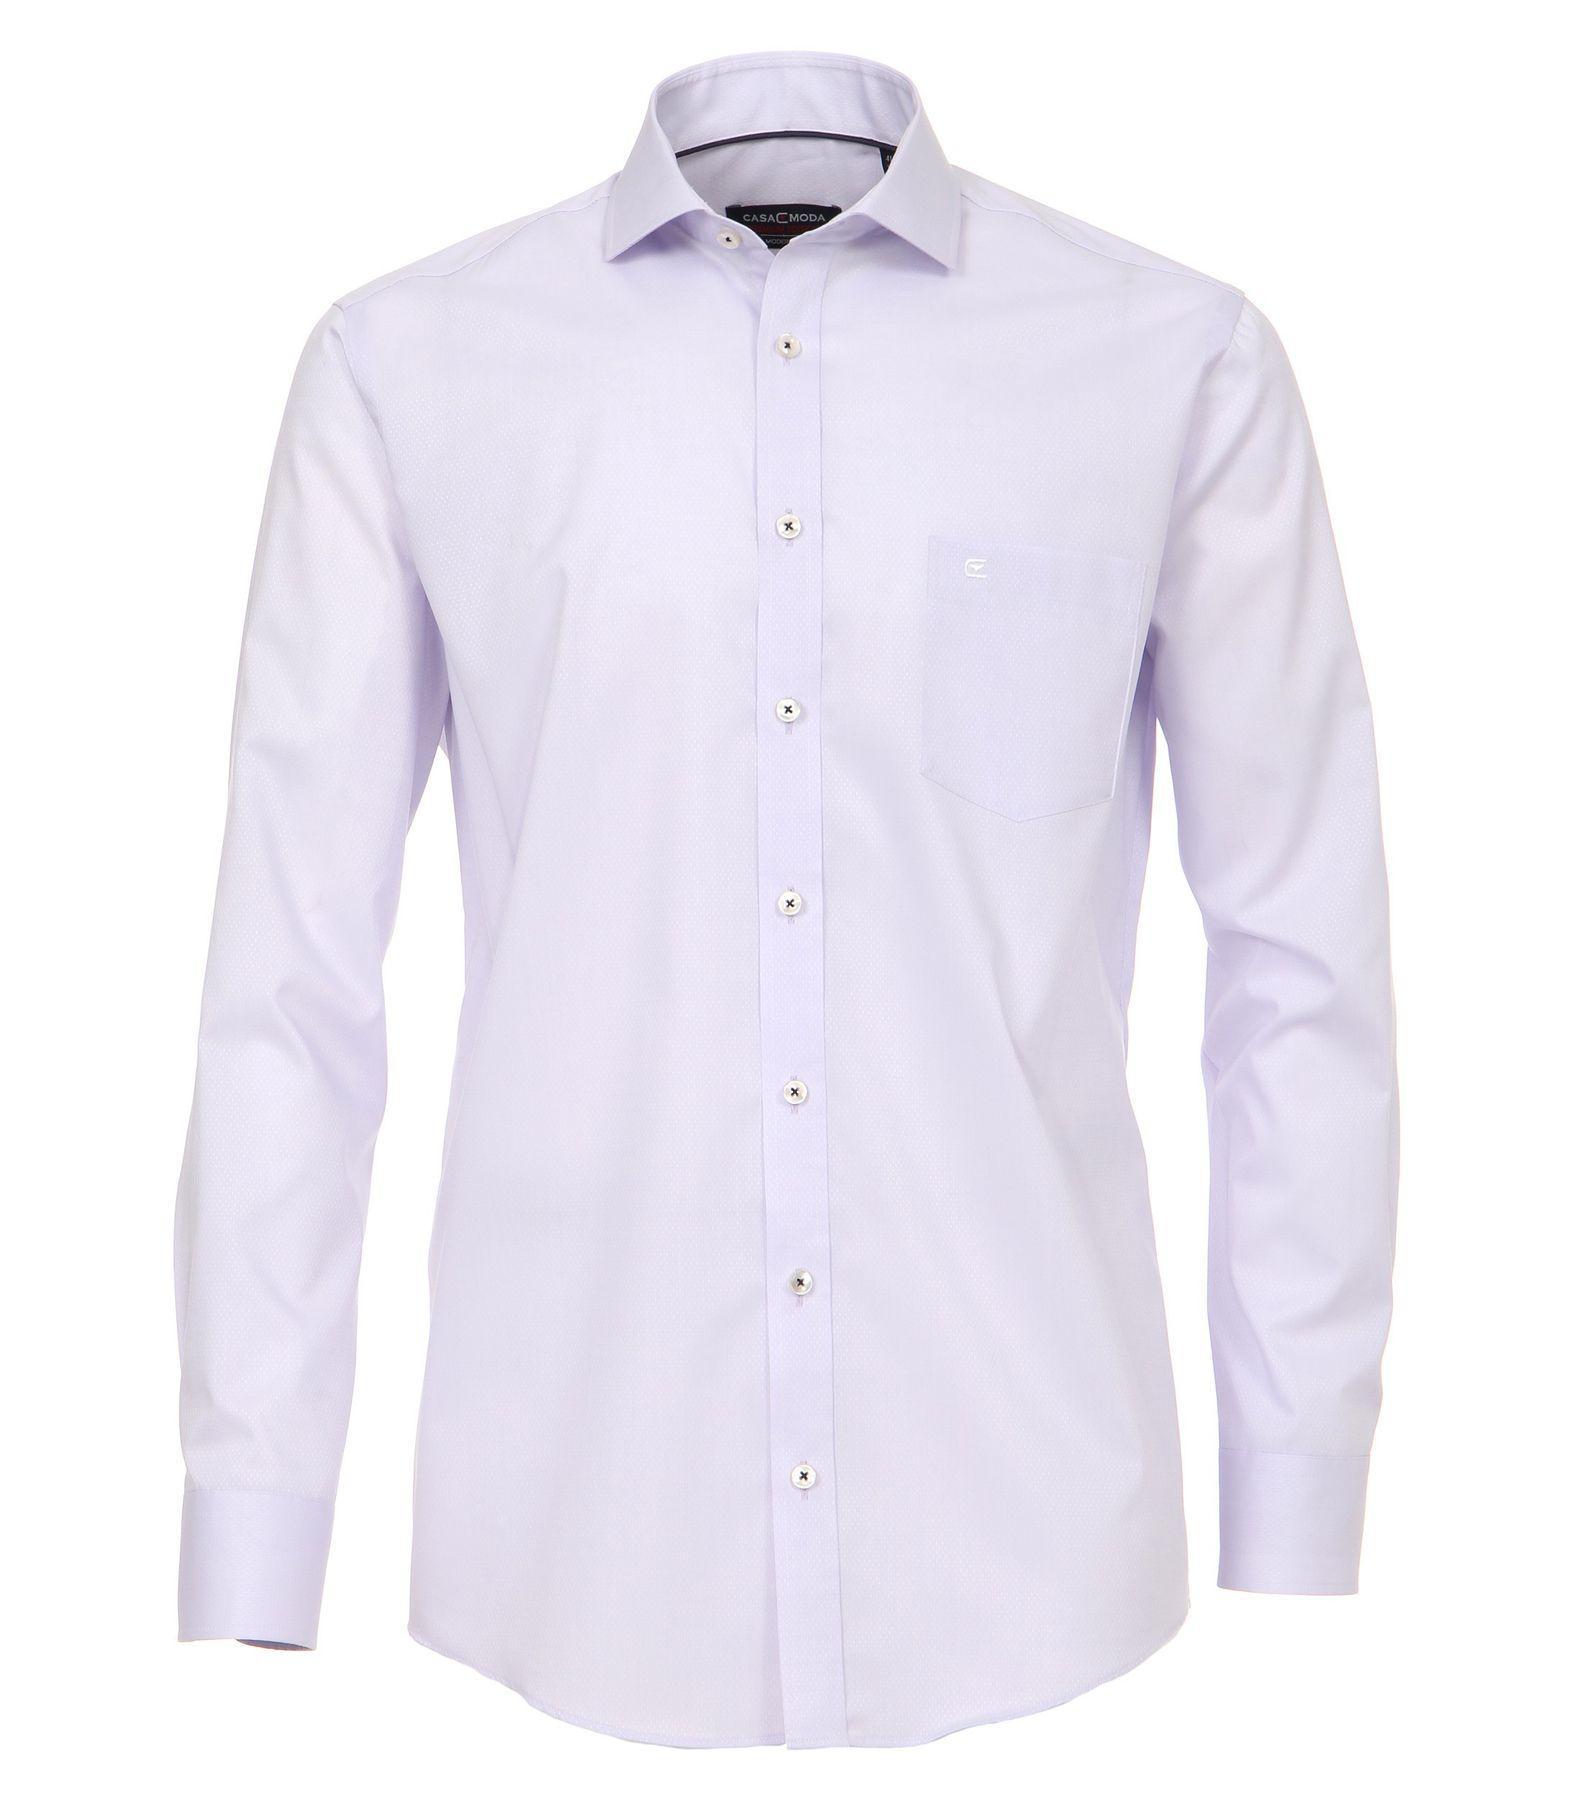 Casa Moda - Modern Fit - Herren langarm Hemd mit Shark Kragen, Uninah (372682600A) – Bild 17